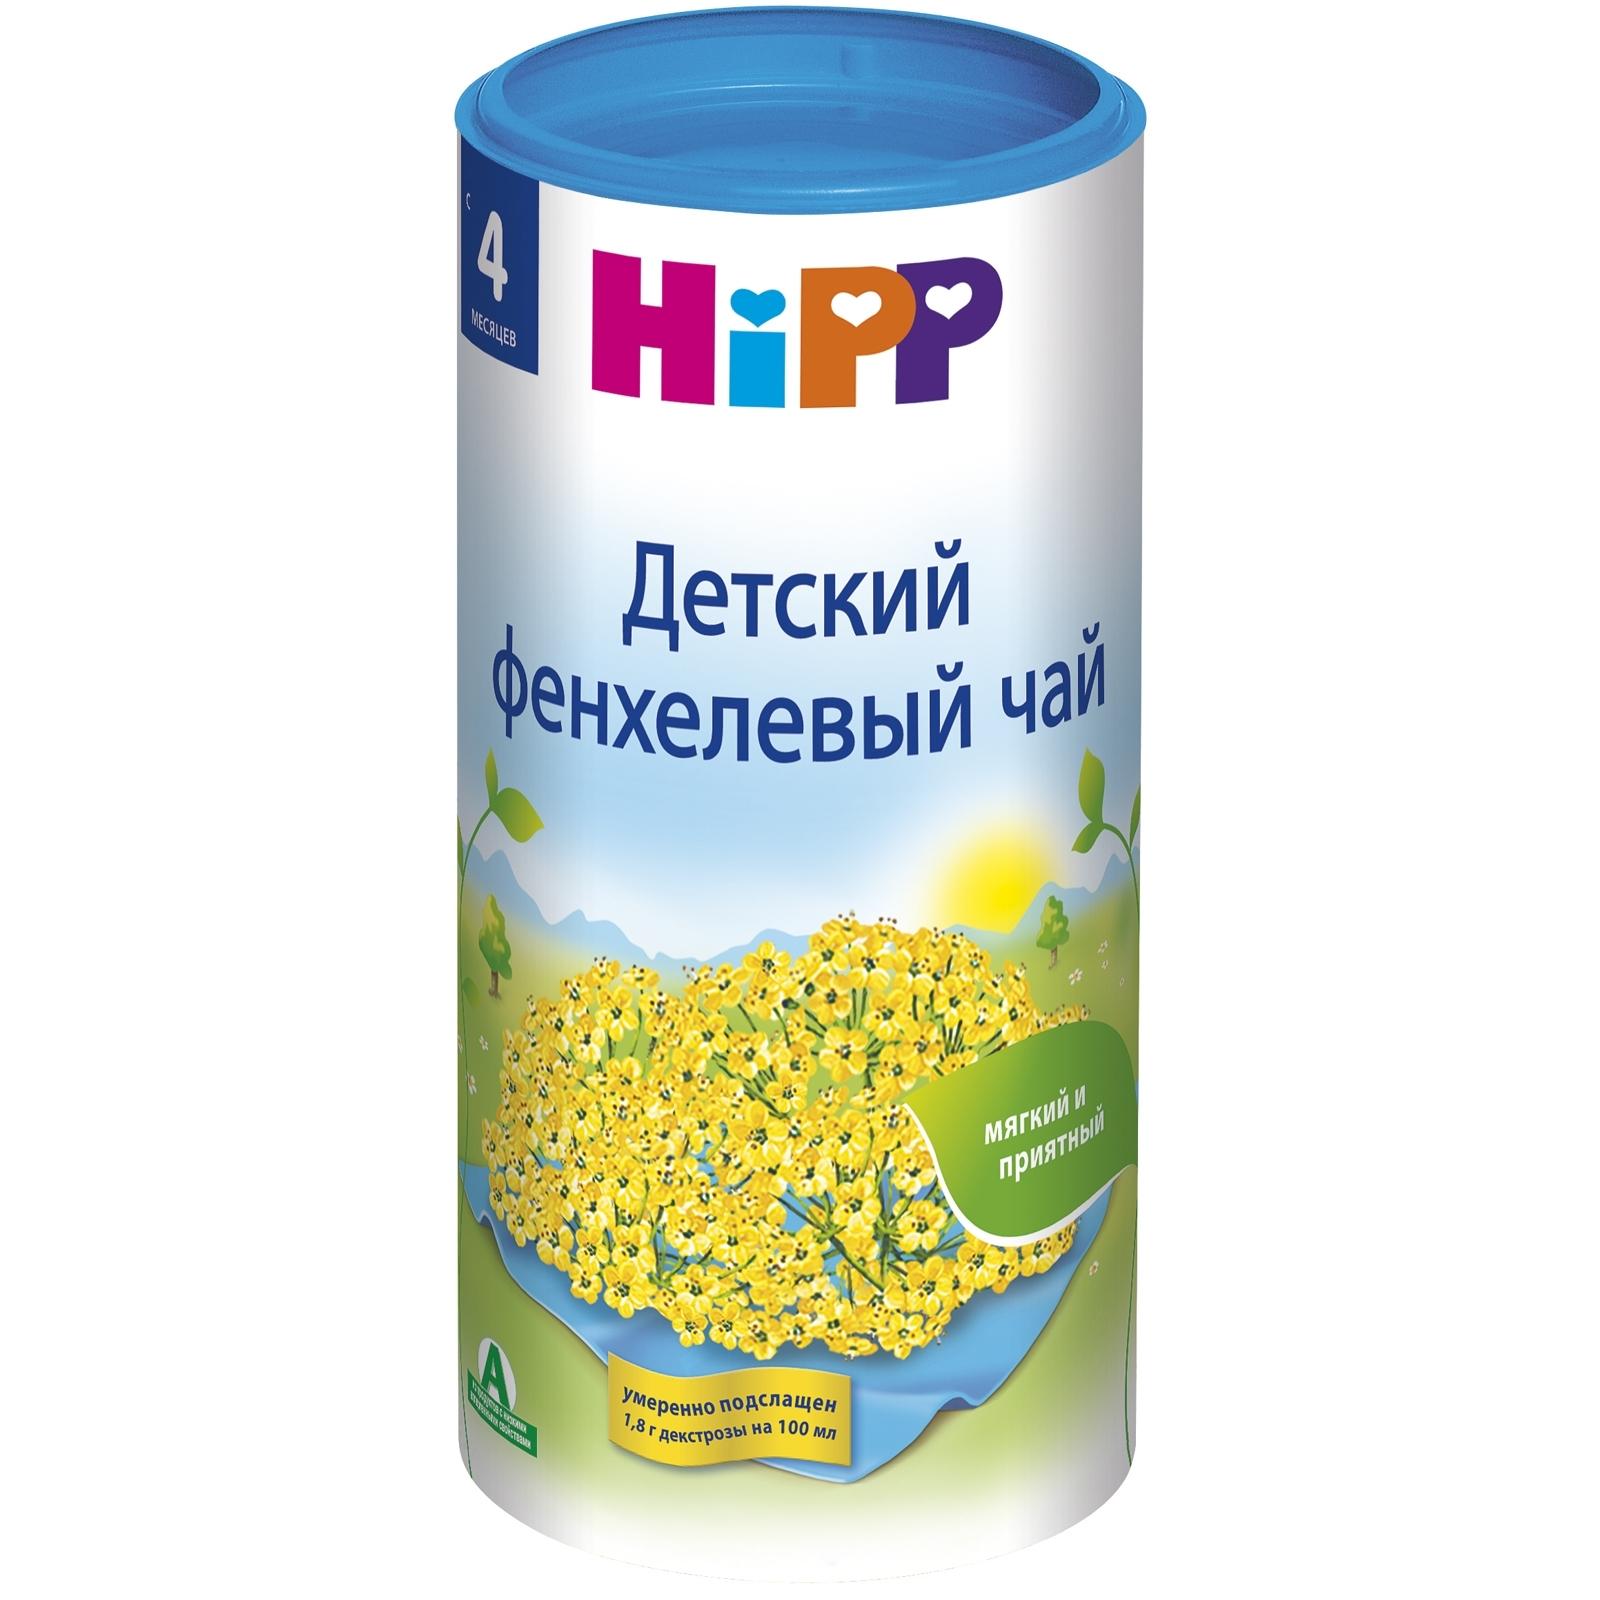 ��� ������� Hipp ����������������� 200 �� ������� (� 4 ���)